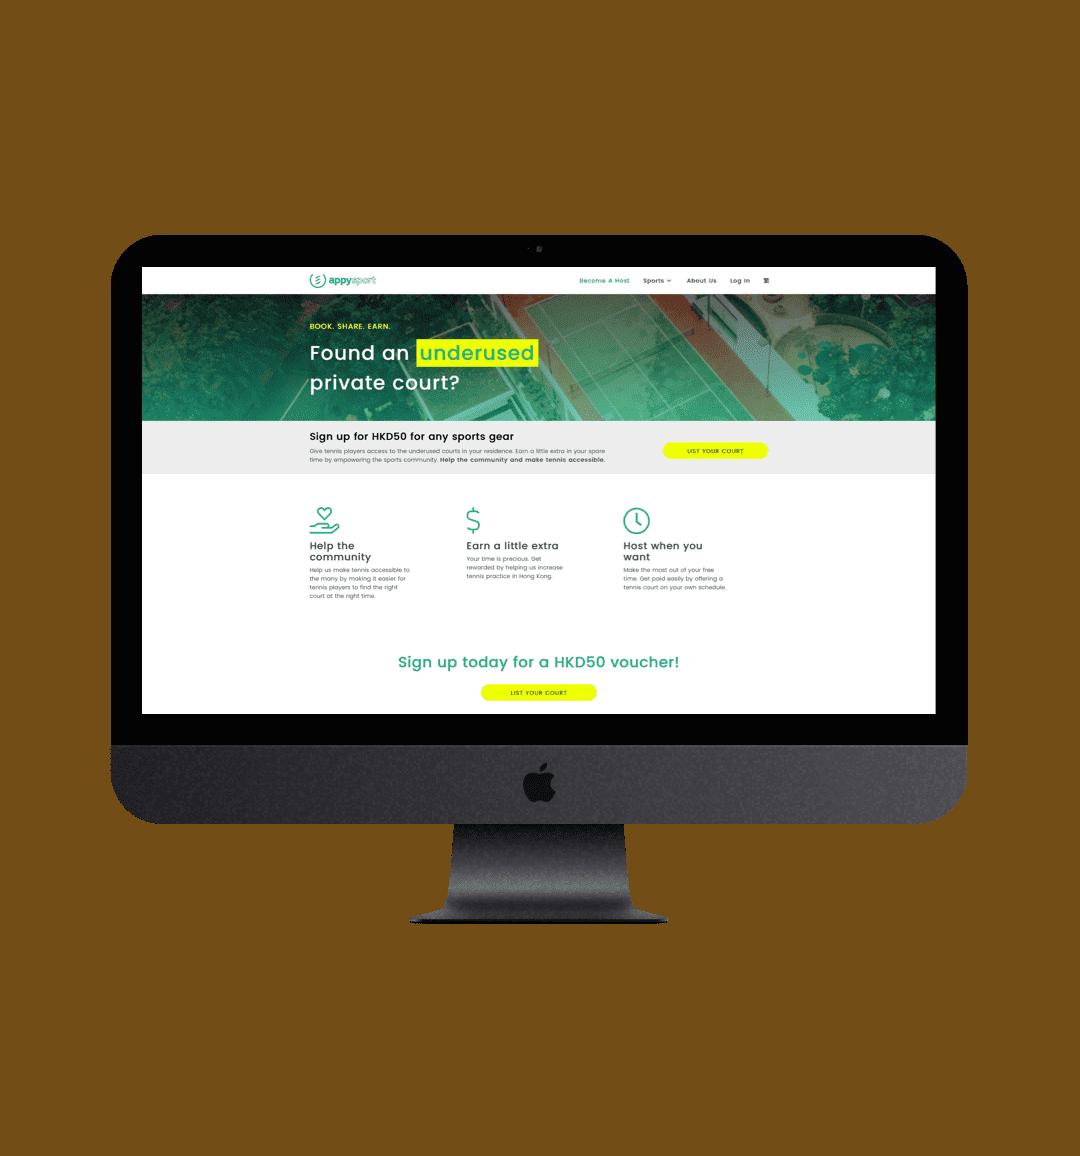 revamped website and UX/UI